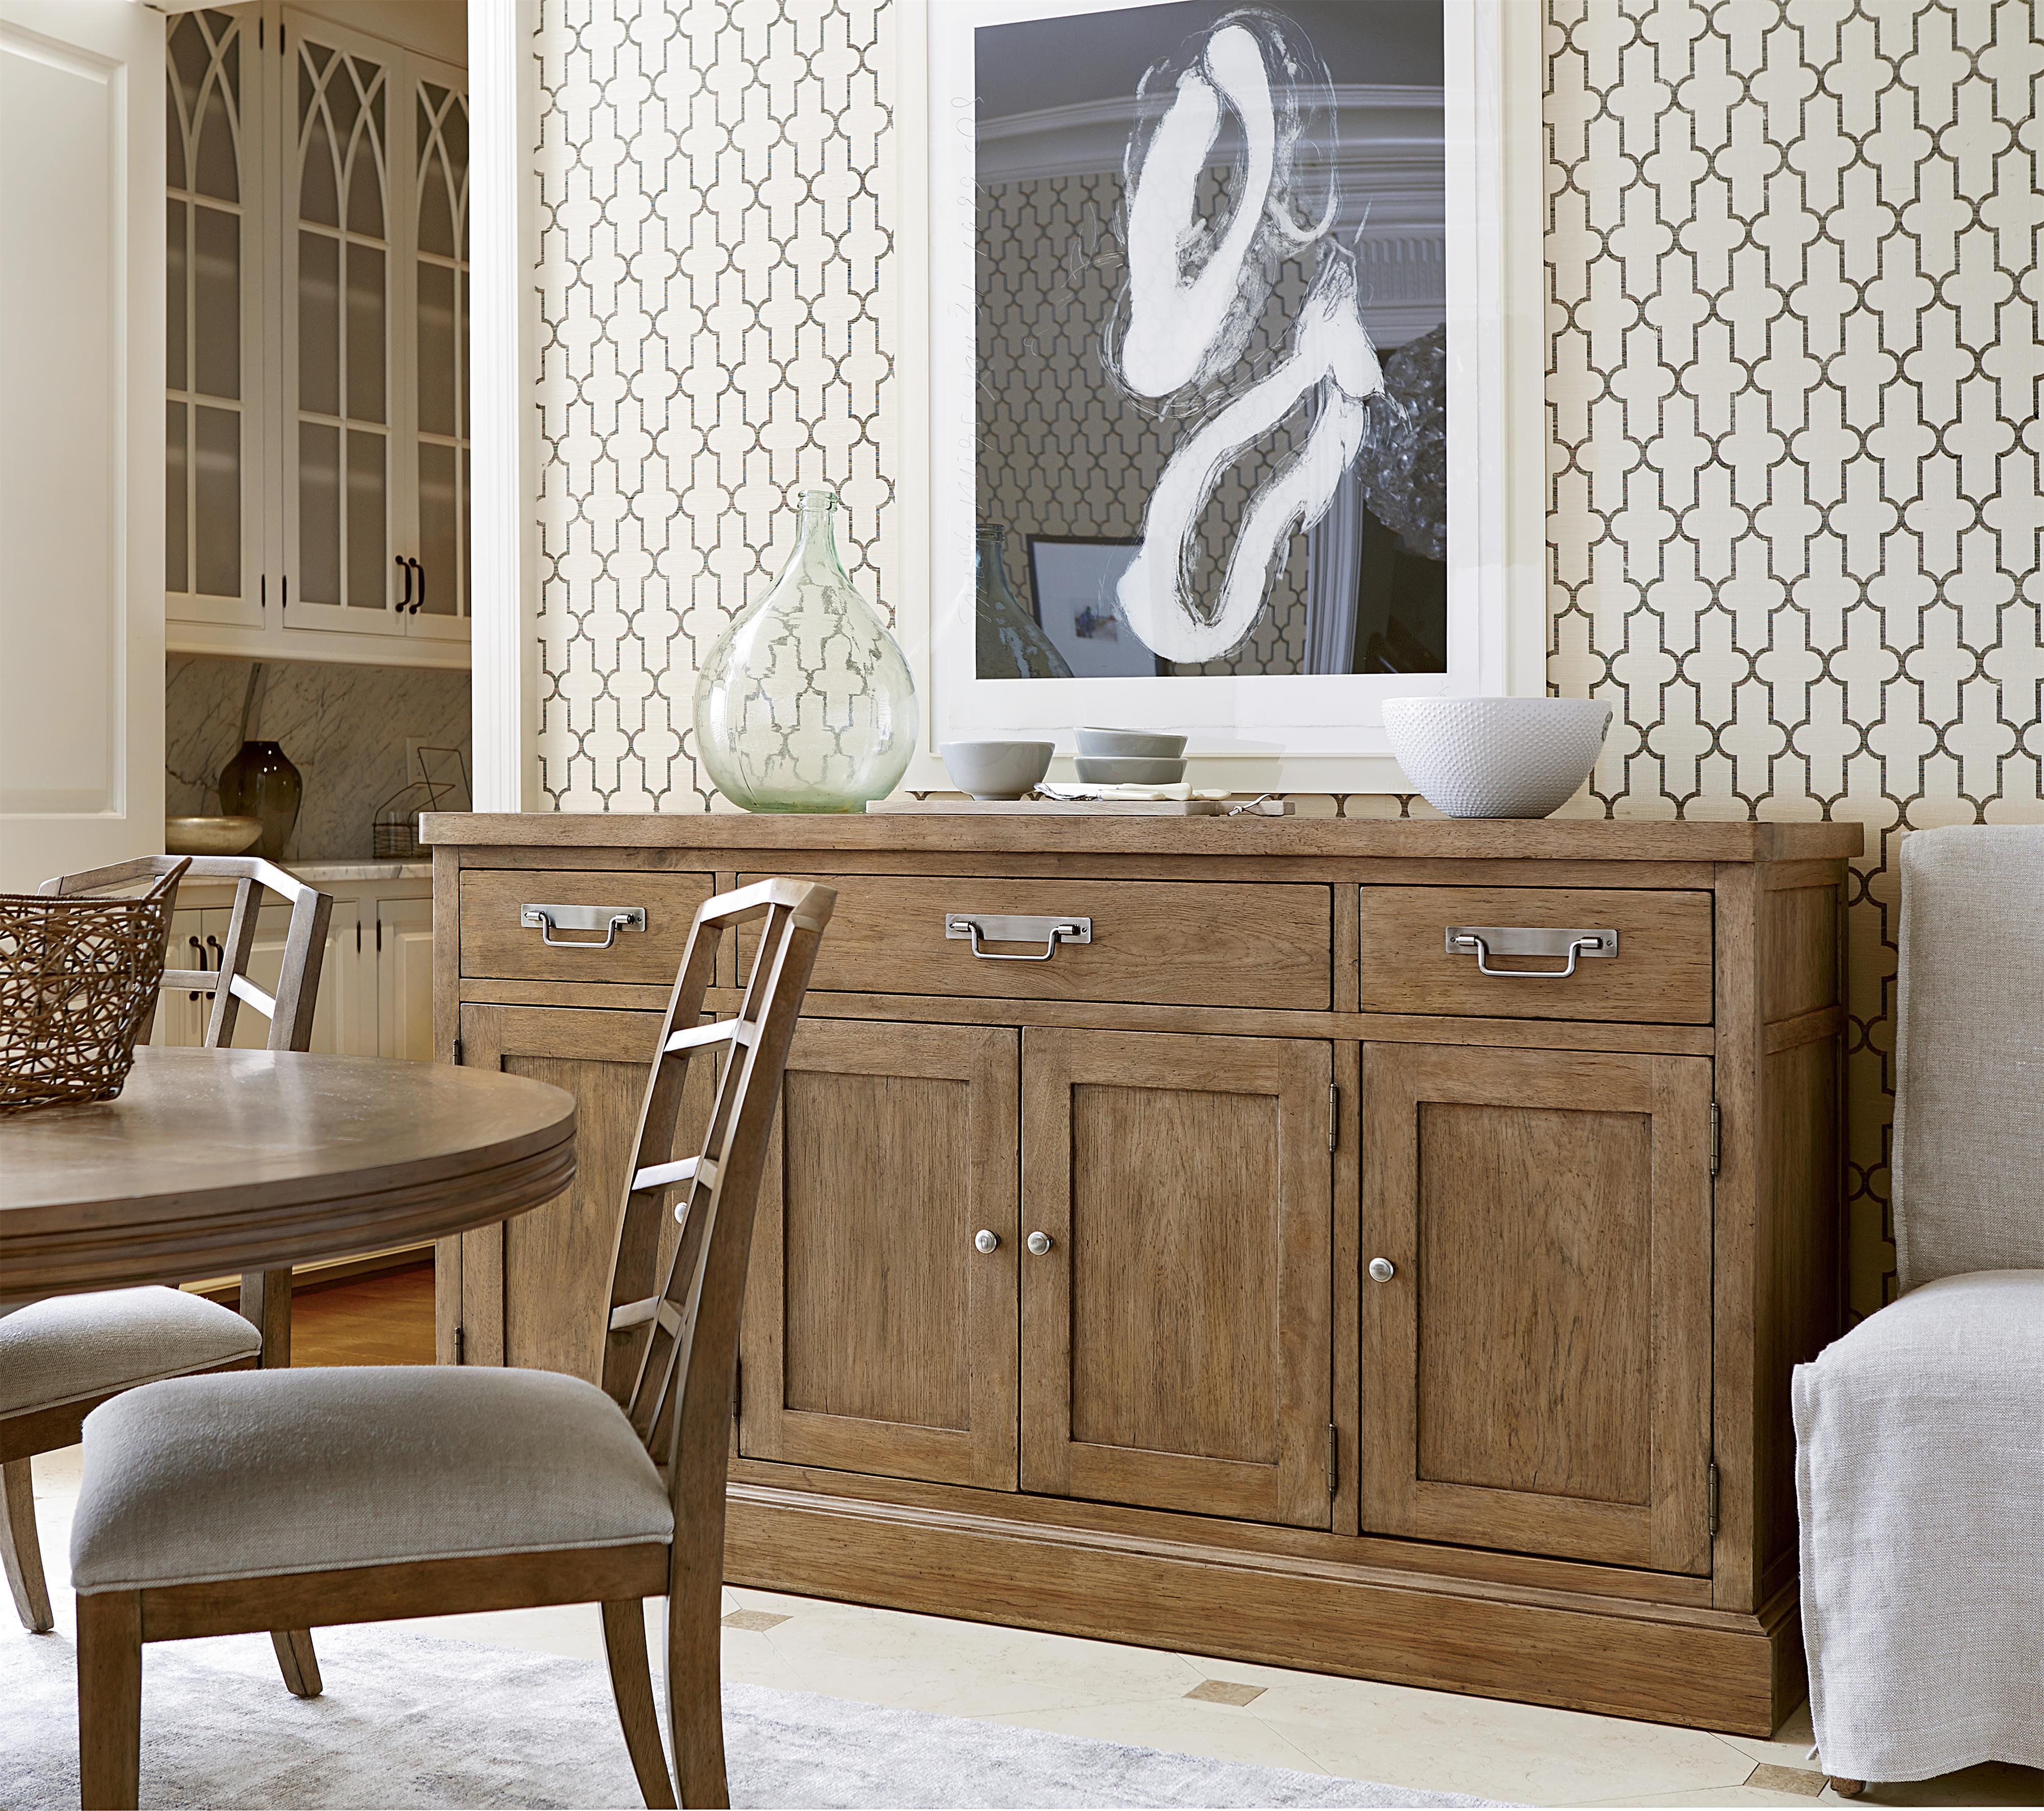 Morris Home Furnishings Montpelier Montpelier Sideboard - Item Number: 349212667